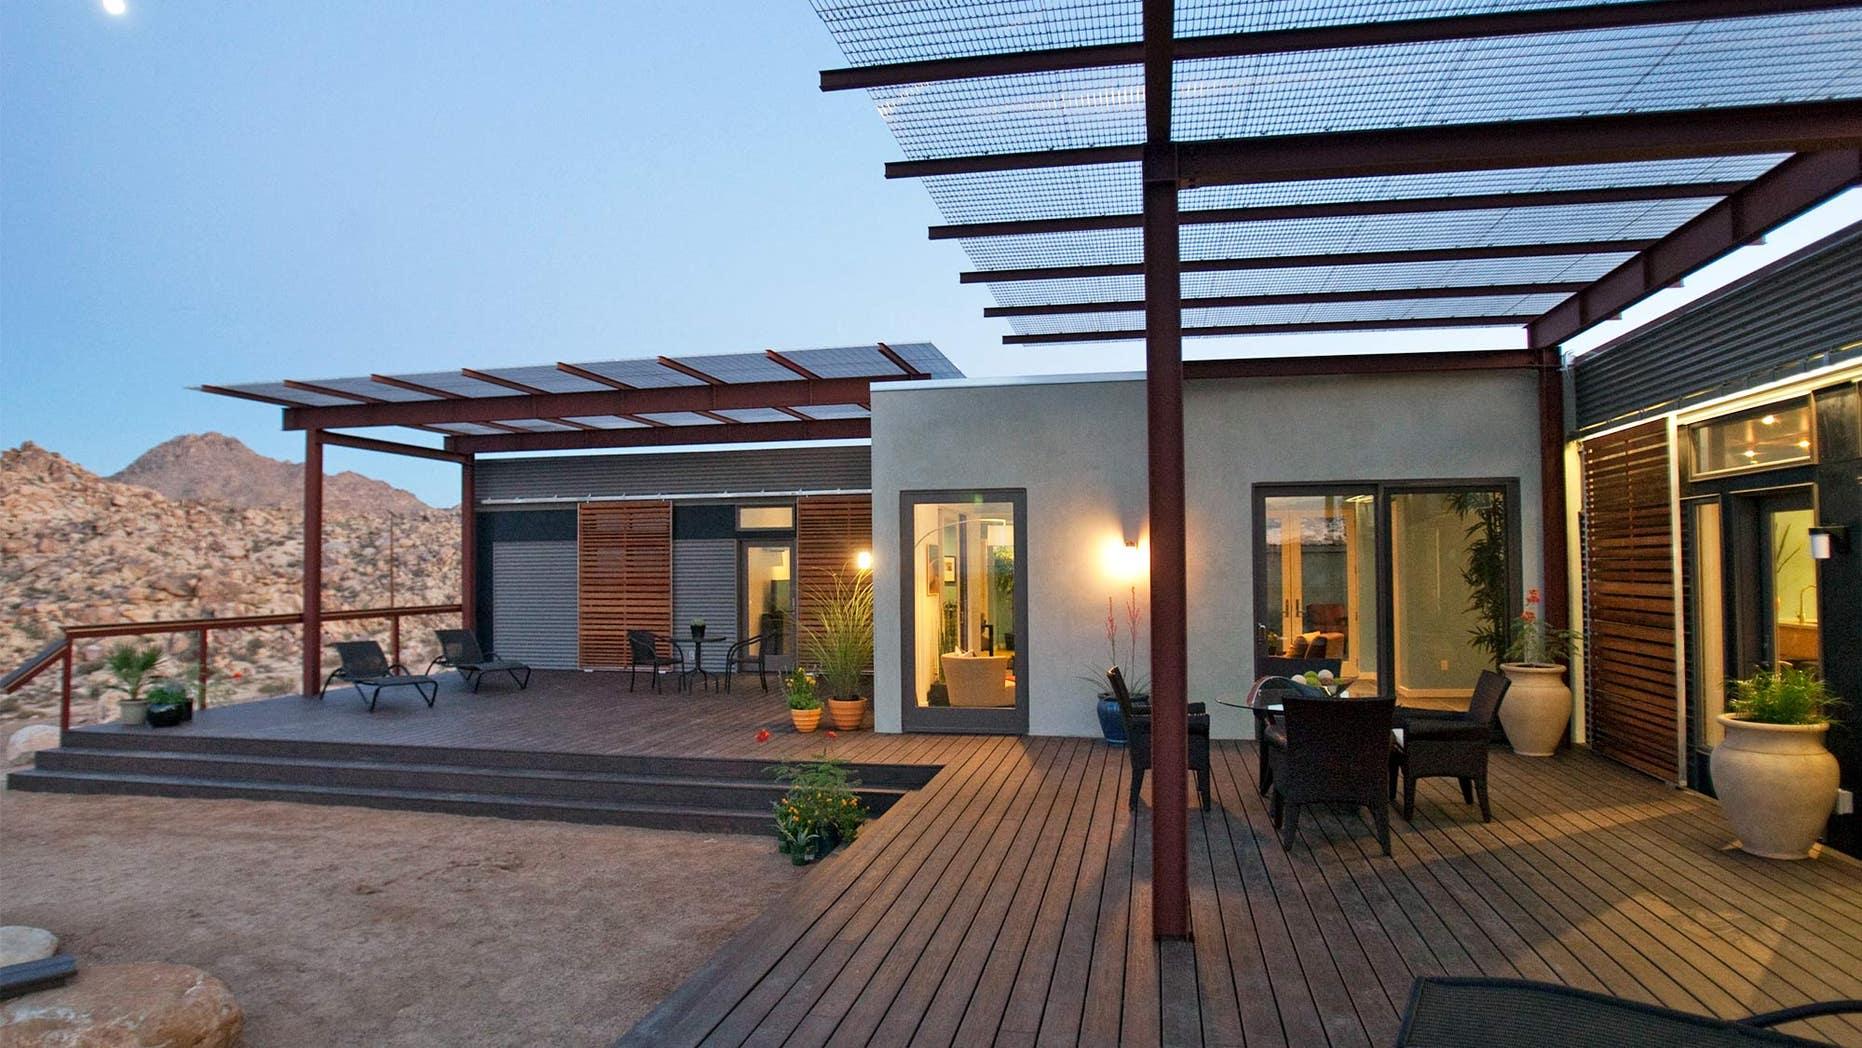 What is a modular home? modular home in joshua tree.